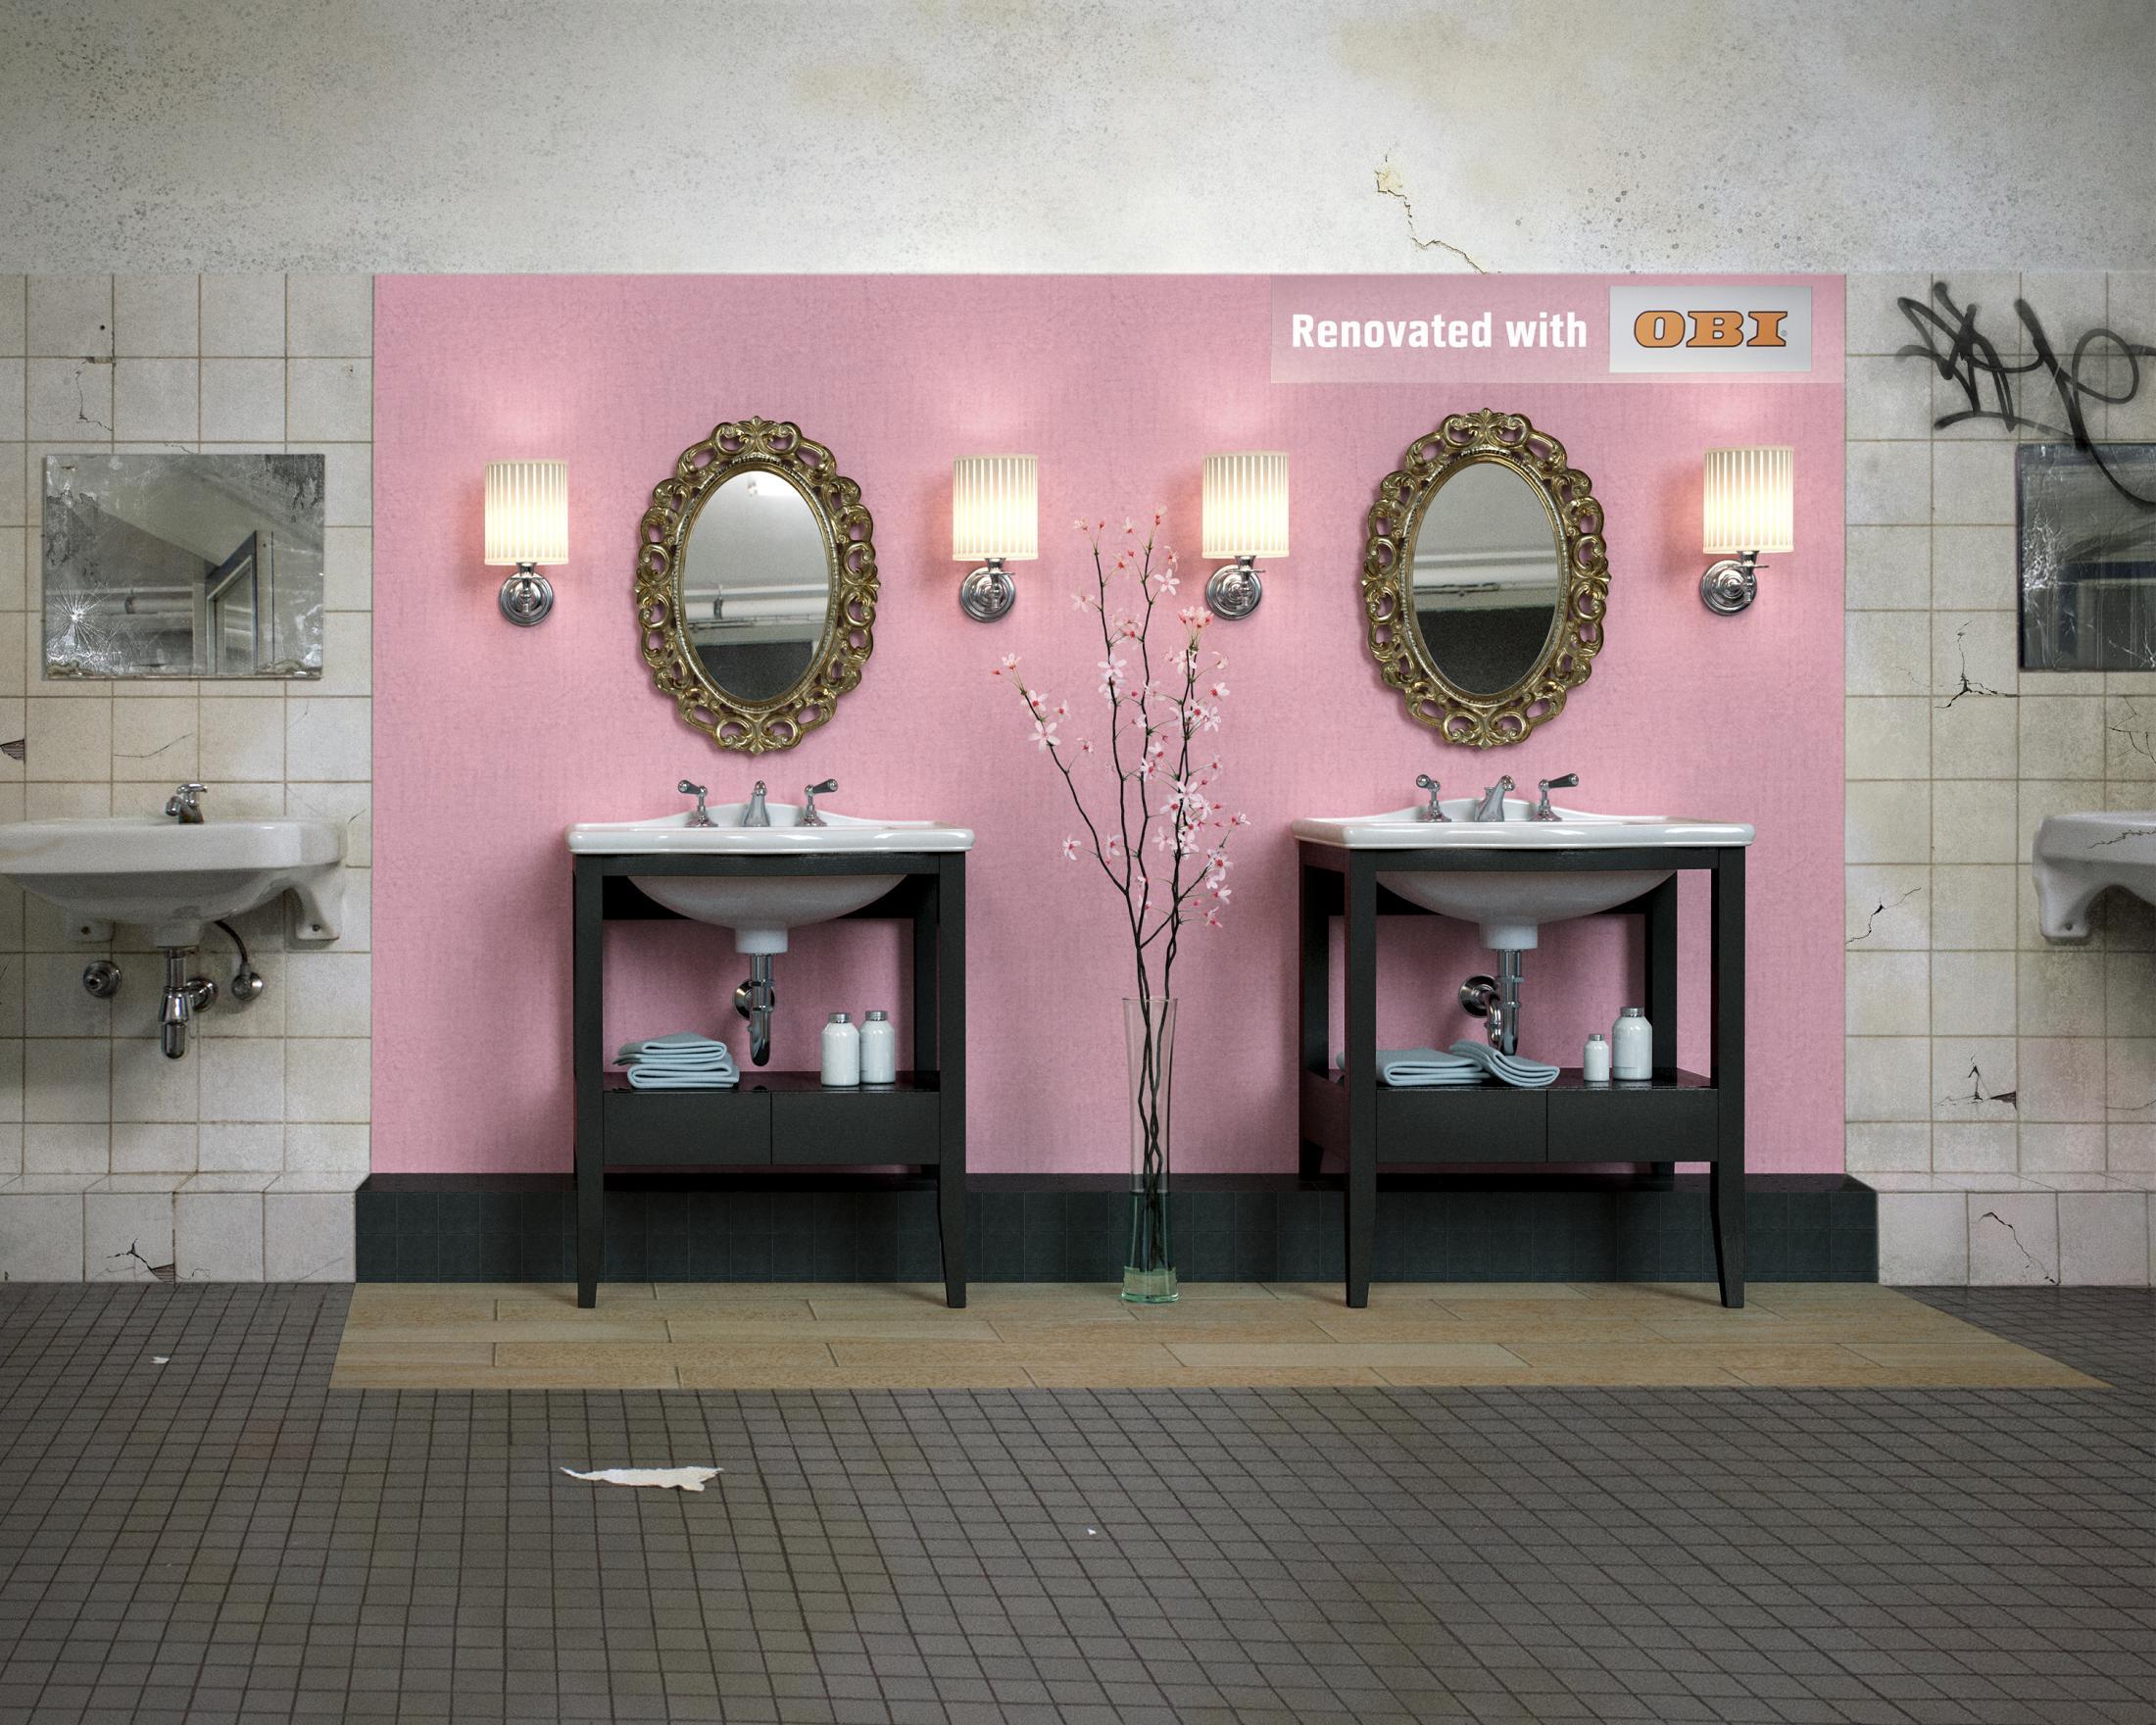 Thumbnail for Public Restroom